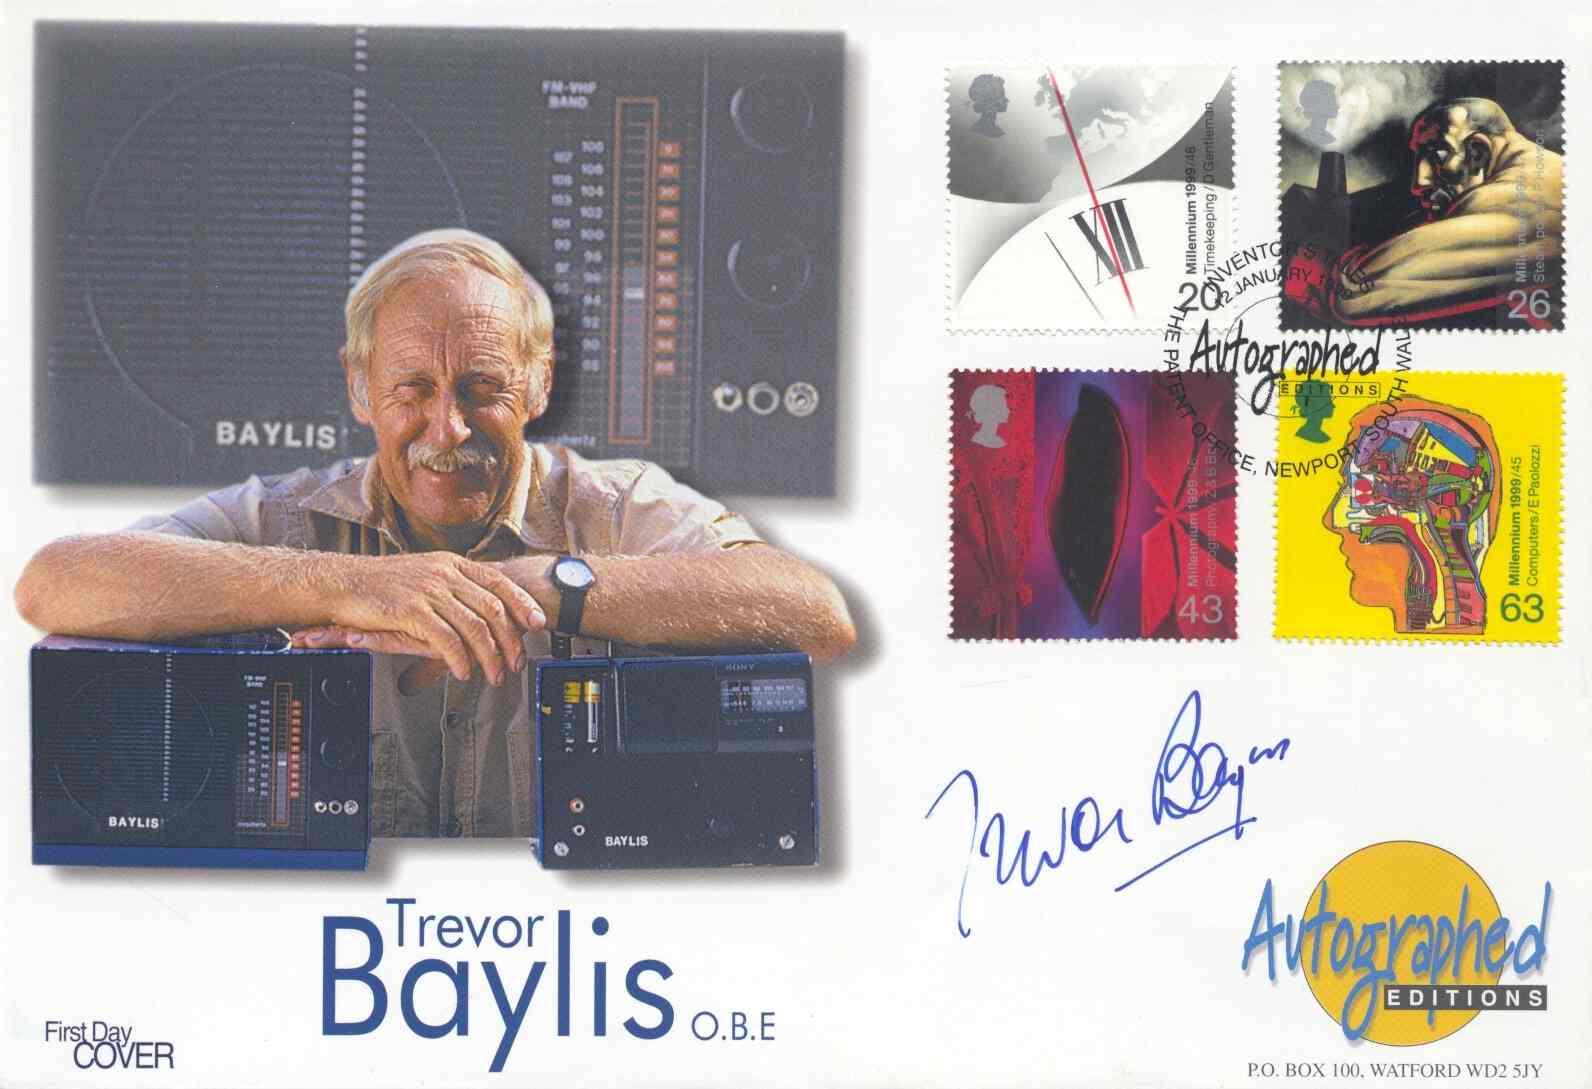 RFE Radio Fernsehen Elektronik Magazin Full Year Edition 1986 ~UPD~ Baylis-1